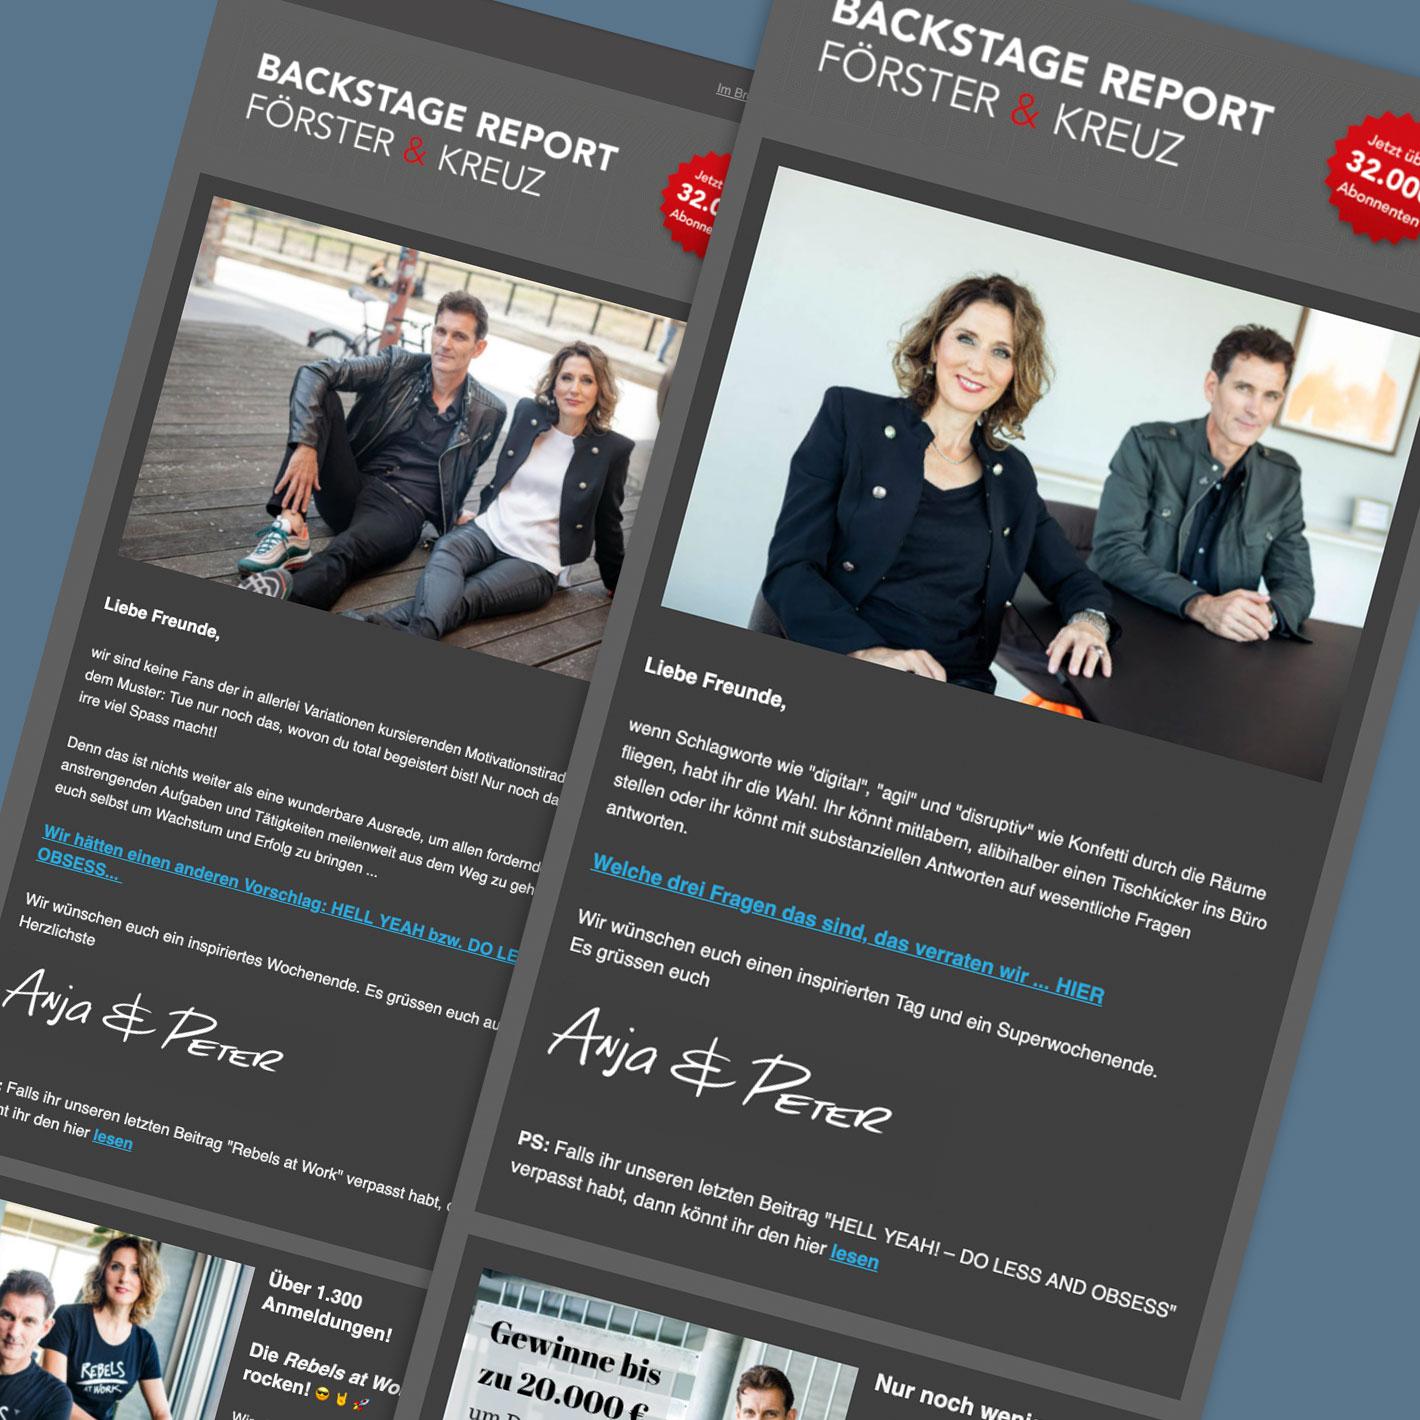 Newsletter Förster & Kreuz